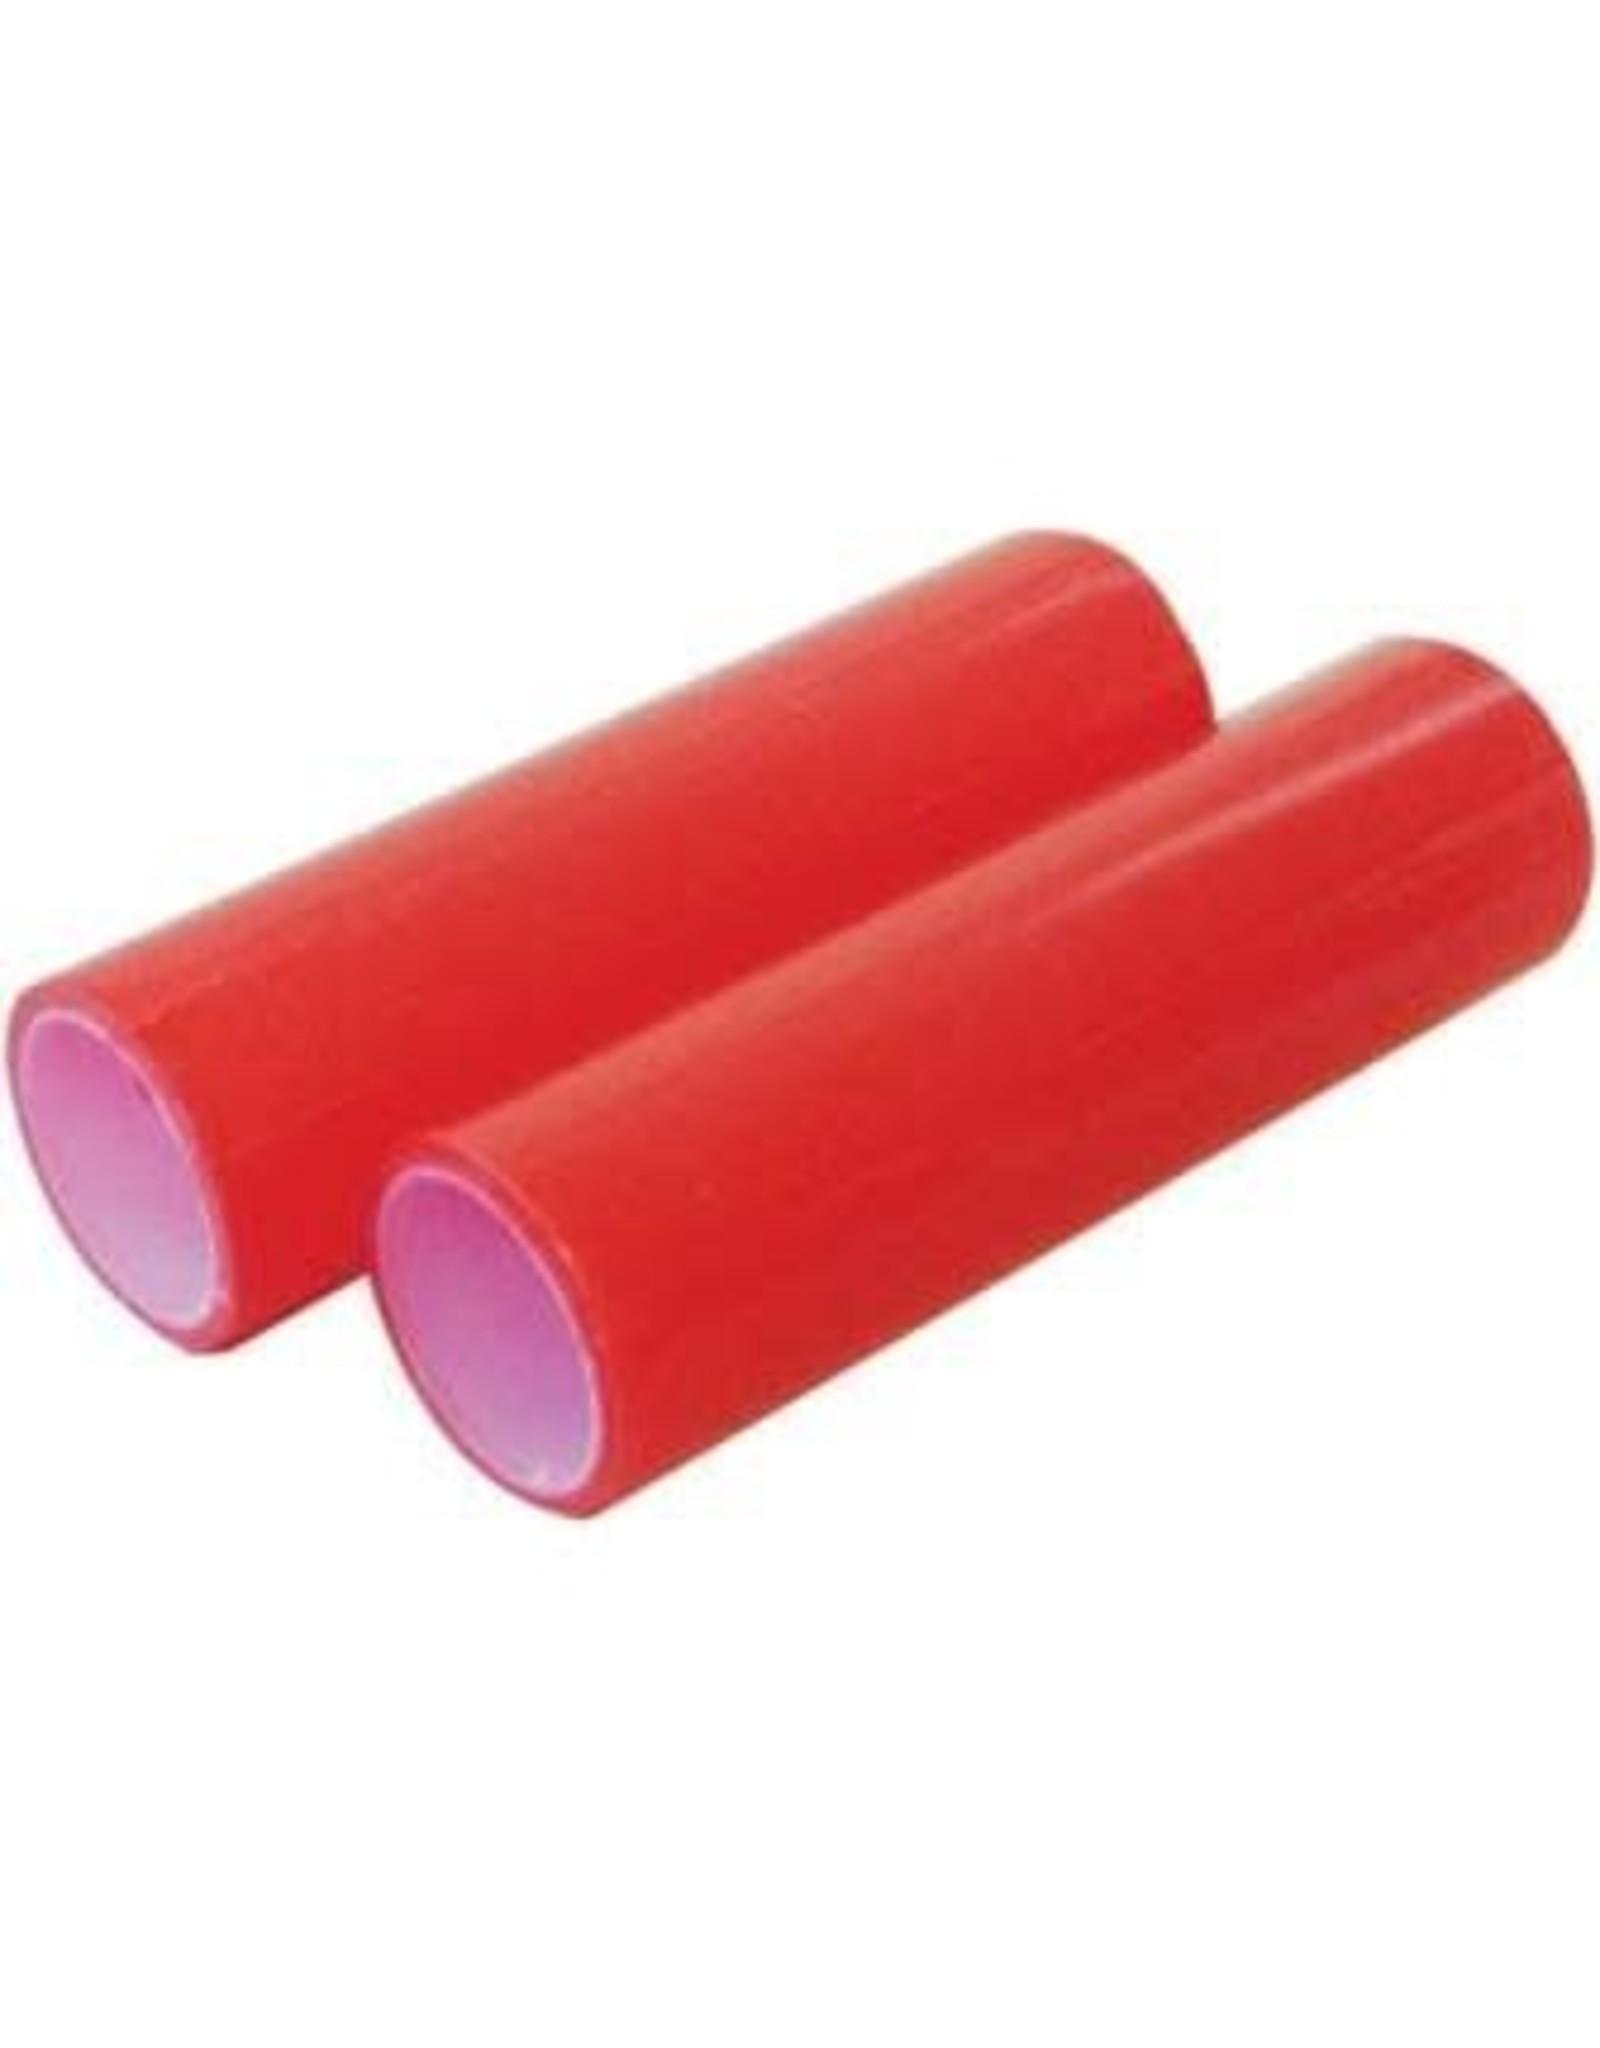 Roll Away Tacky Roller Refills (40%)